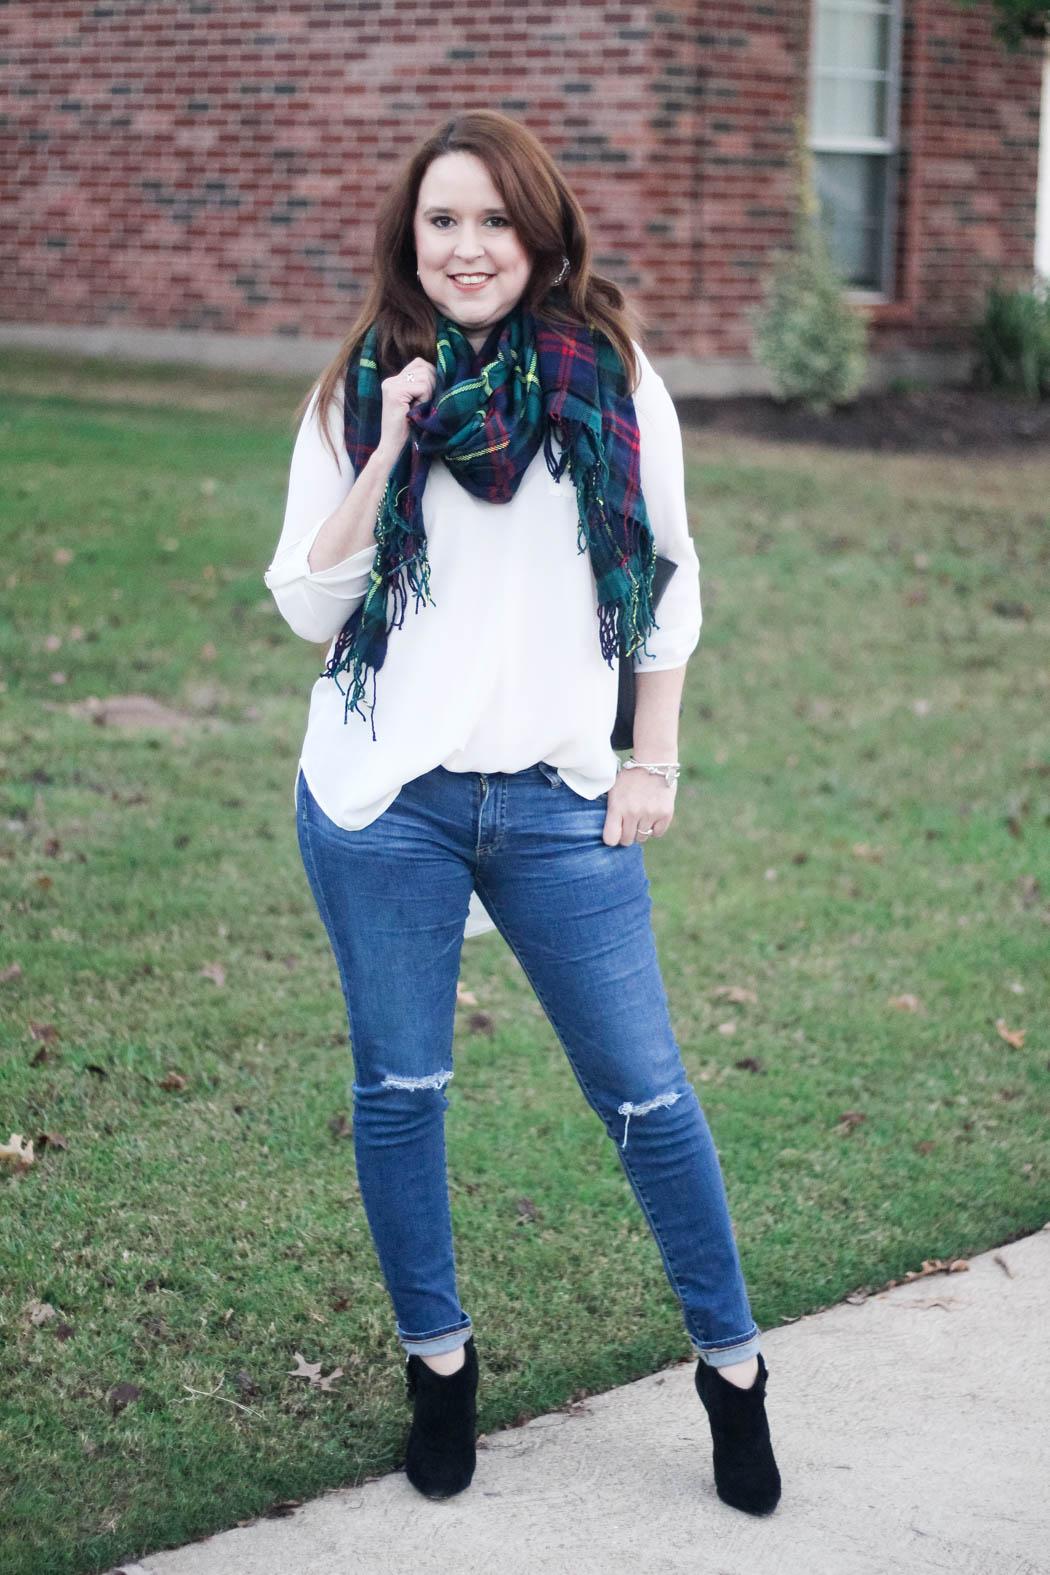 target-scarf-lush-tunic-ag-jeans-coach-bag-charles-david-booties-9